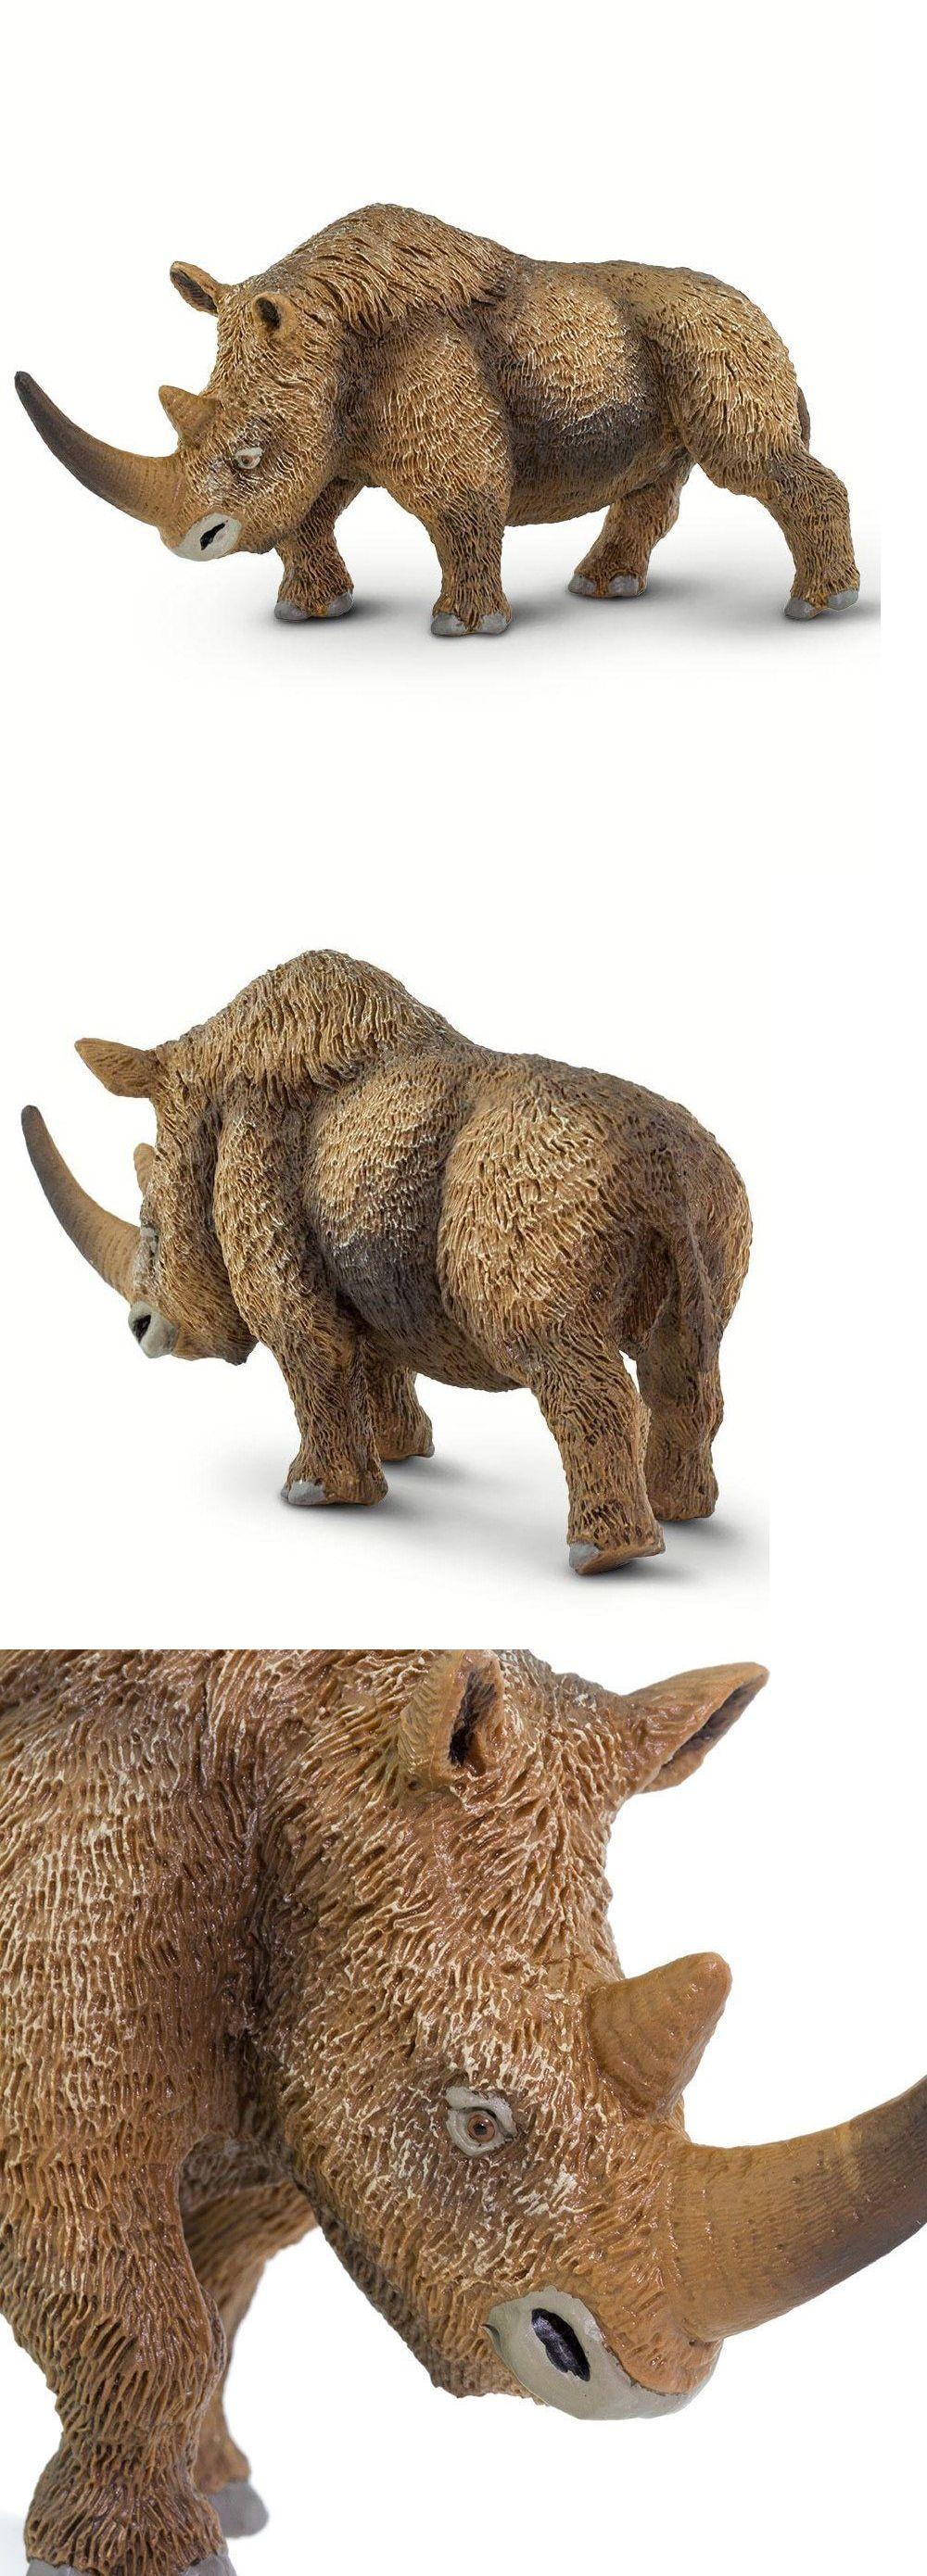 Dinosaurs 19170 Woolly Rhinoceros Dinosaur 100089 New